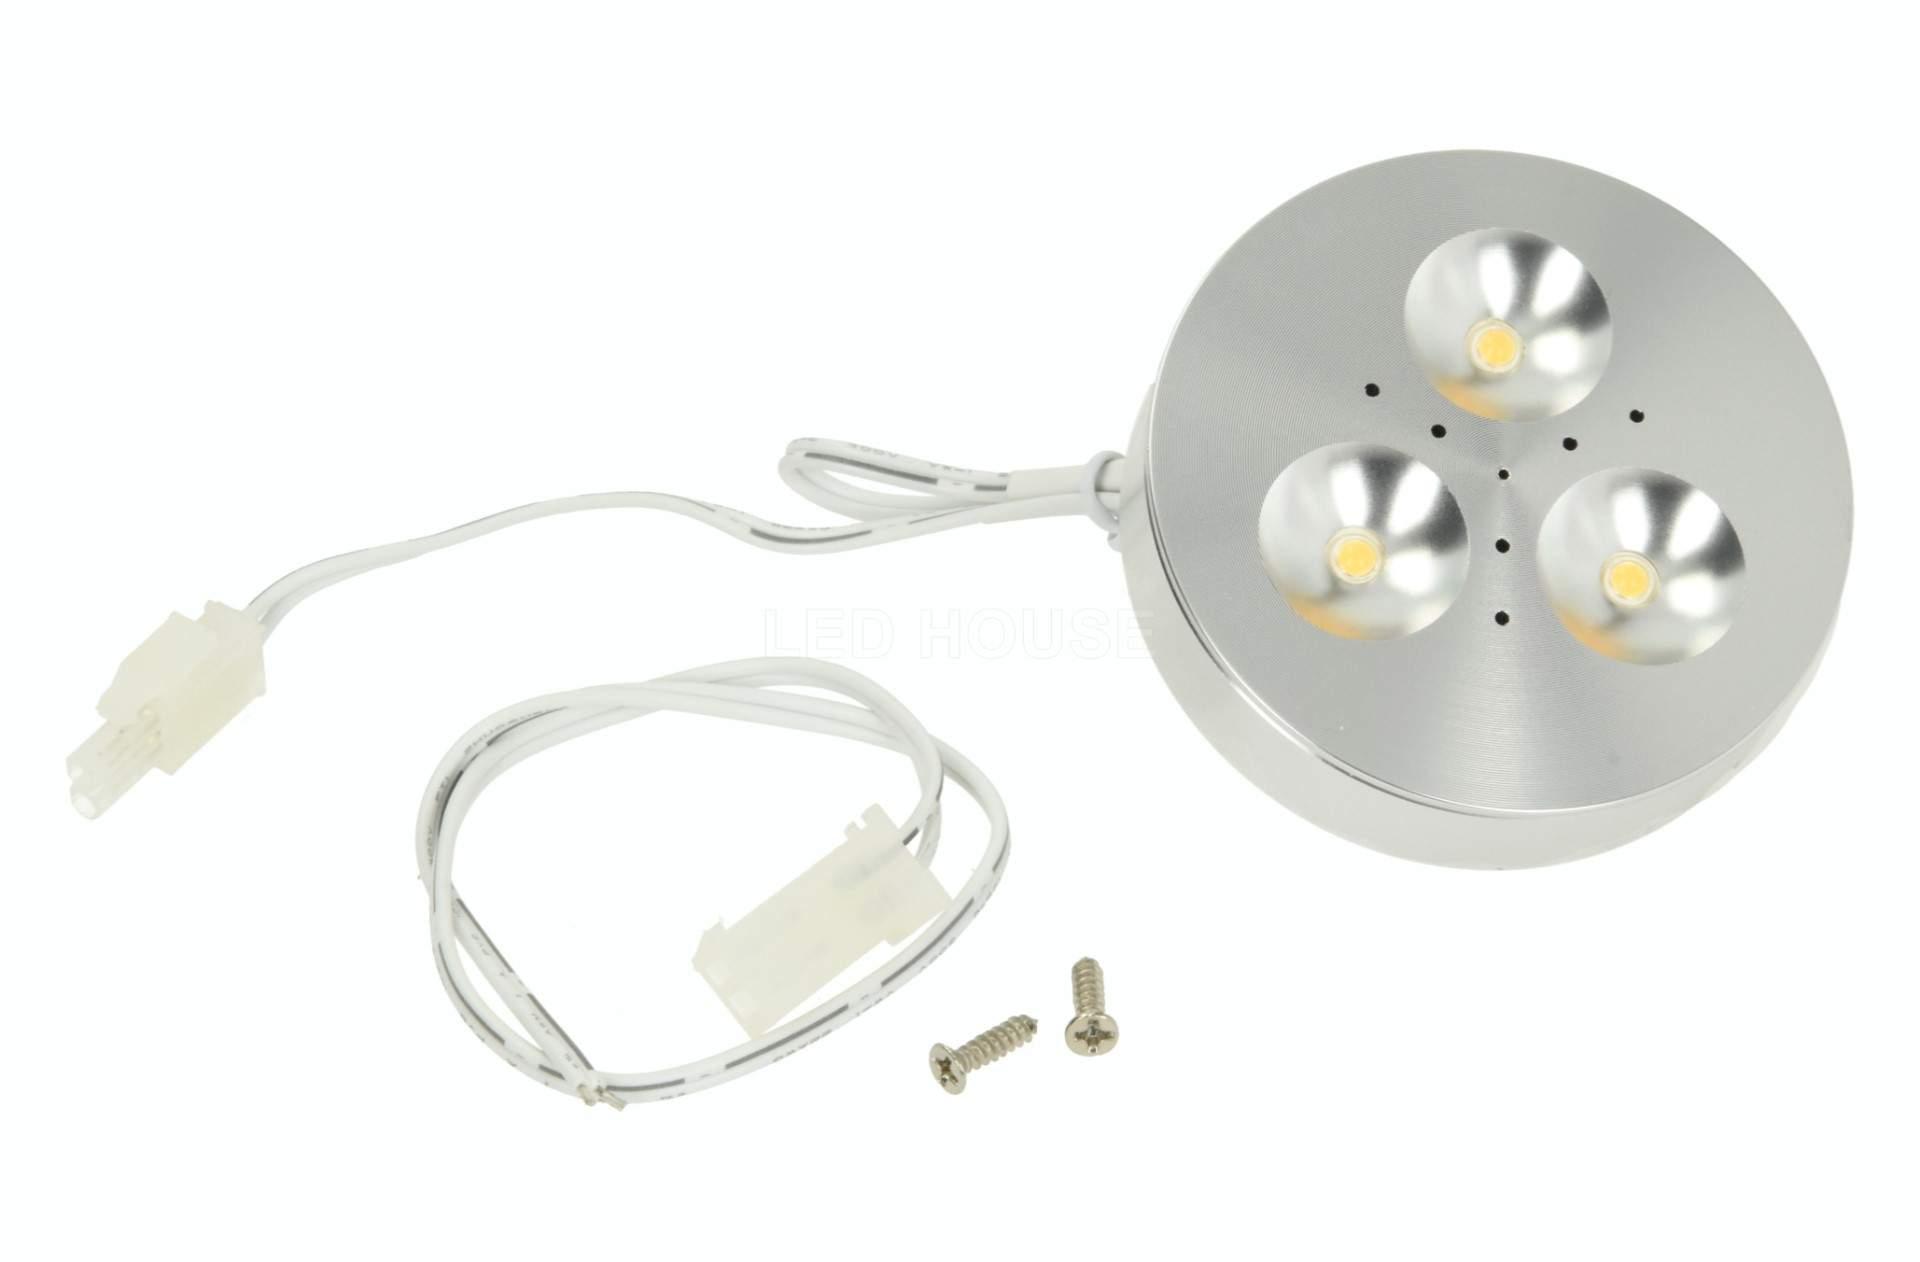 LED furniture light LED furniture light PROLUMEN MV-L silvery  12V 3W 210lm  120° 3000K warm white